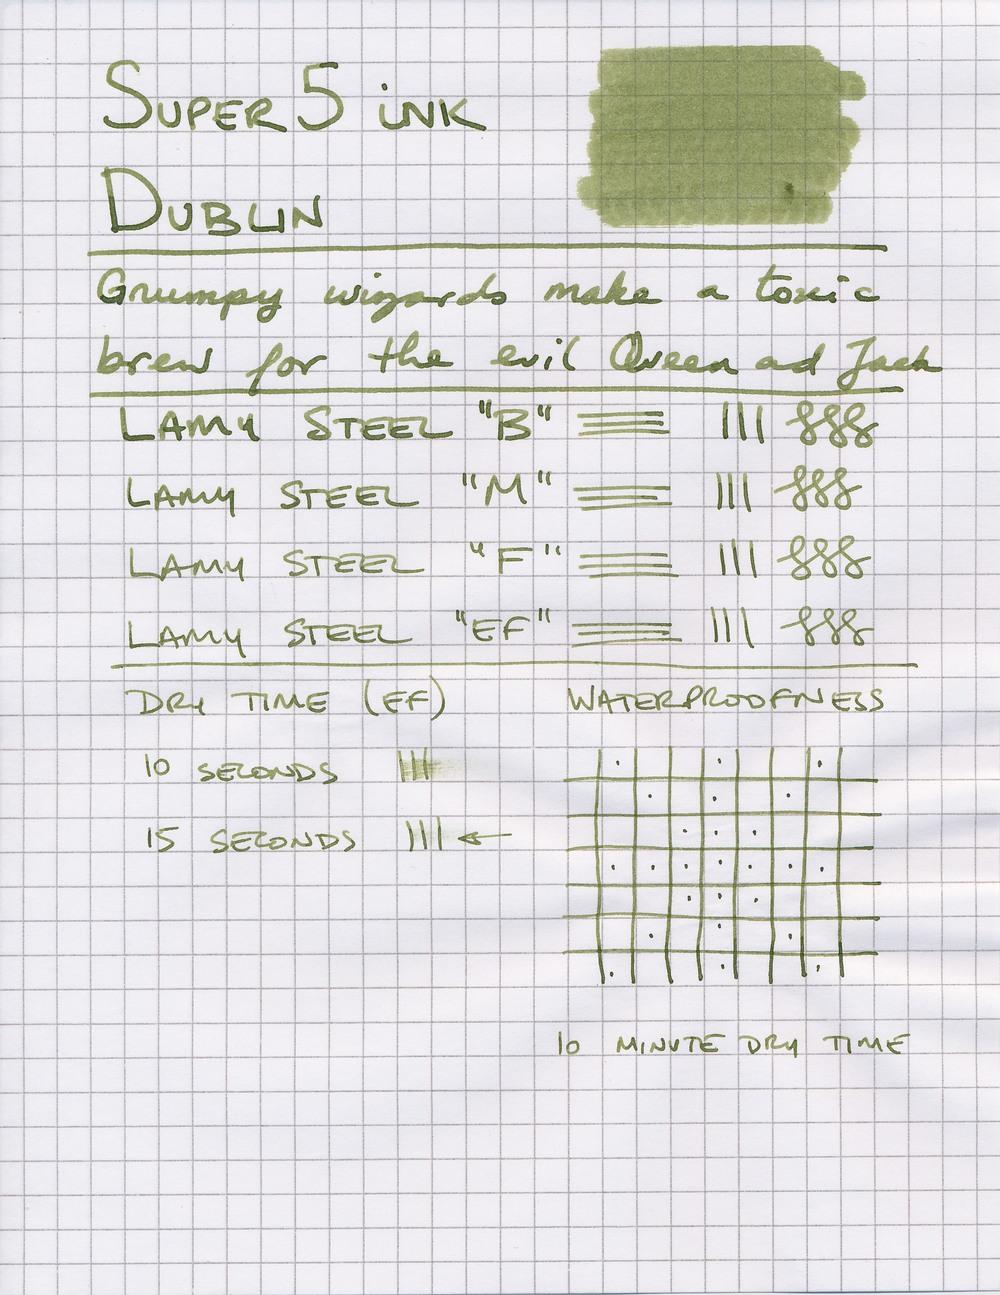 Writing Sample on Rhodia 80 gsm